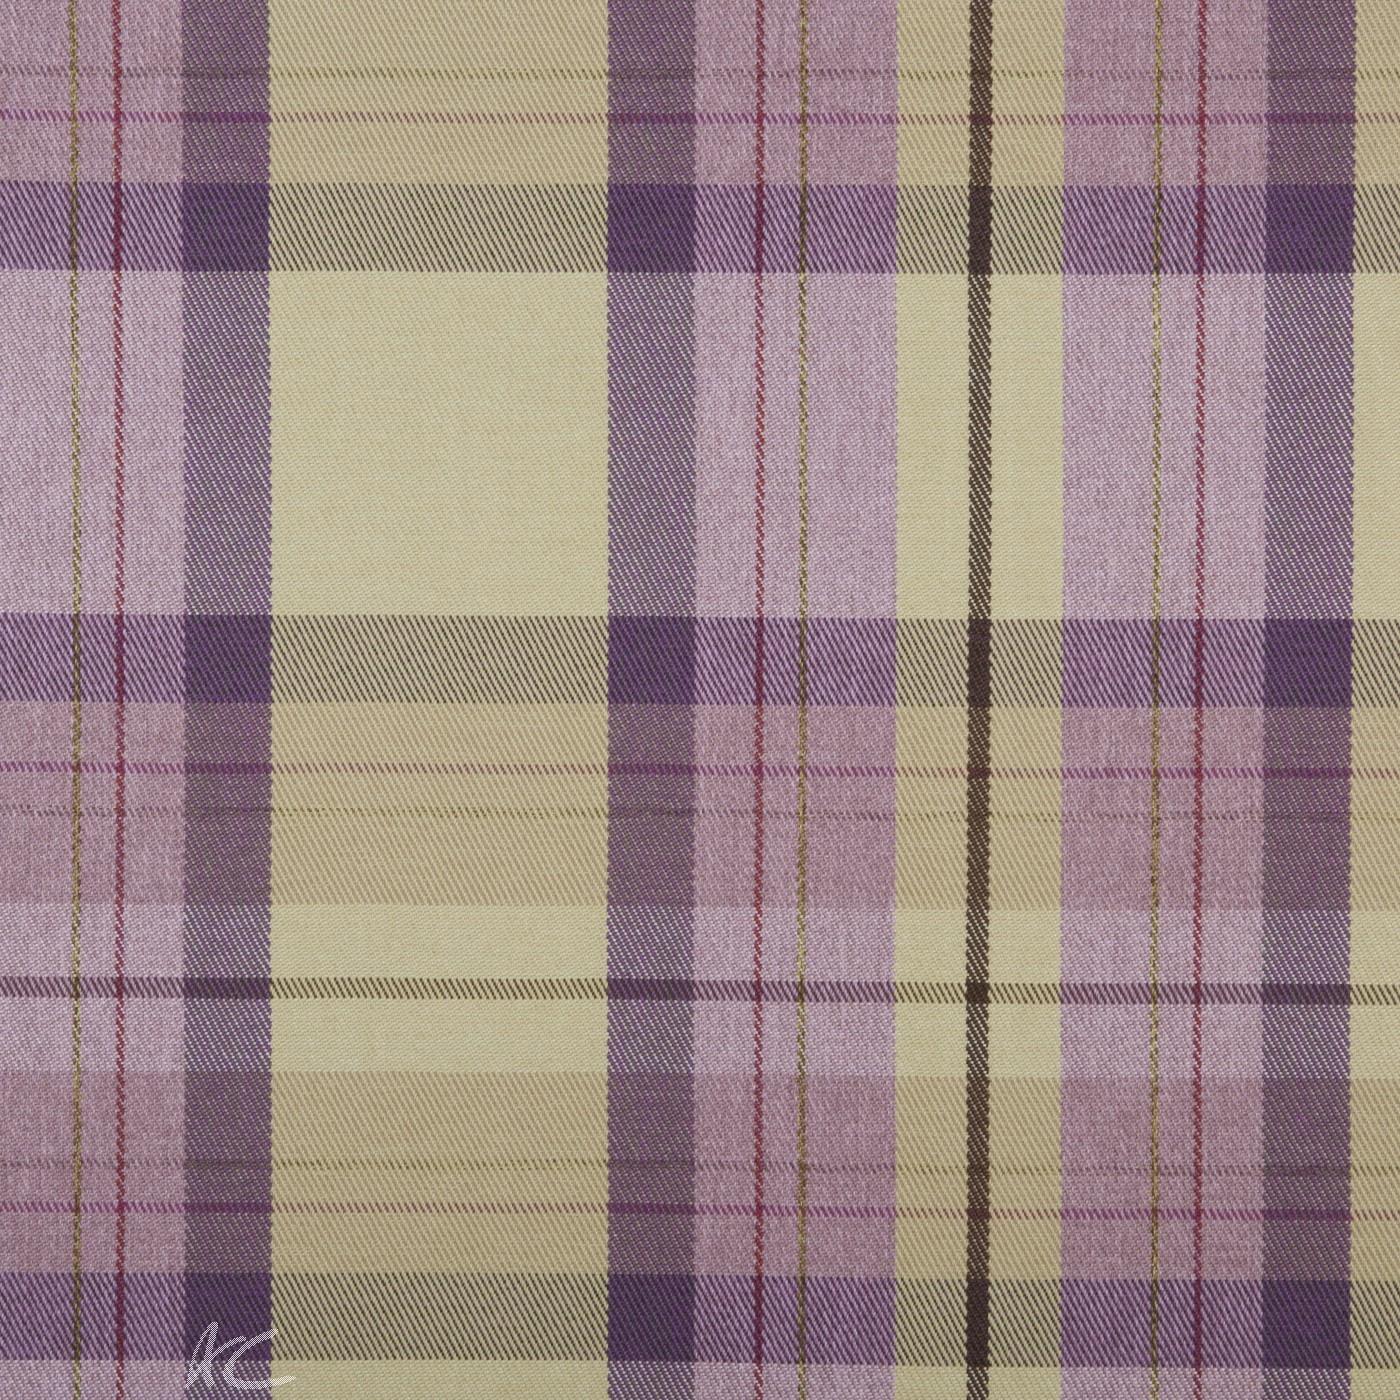 Prestigious Textiles Highlands Cairngorm Thistle Curtain Fabric